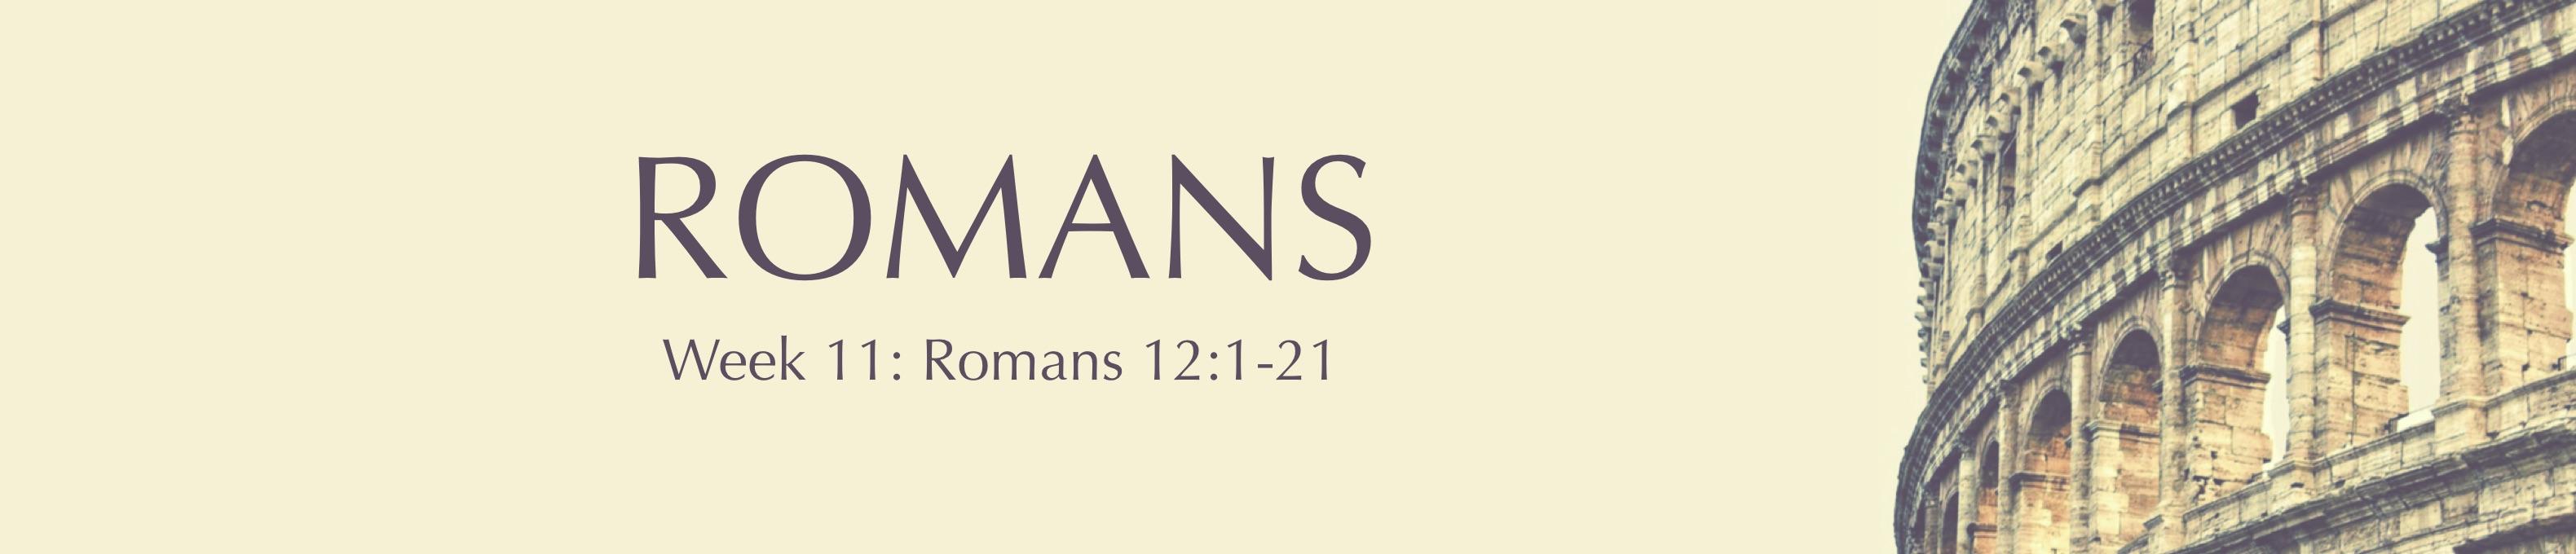 11 Week 11 Romans Banner